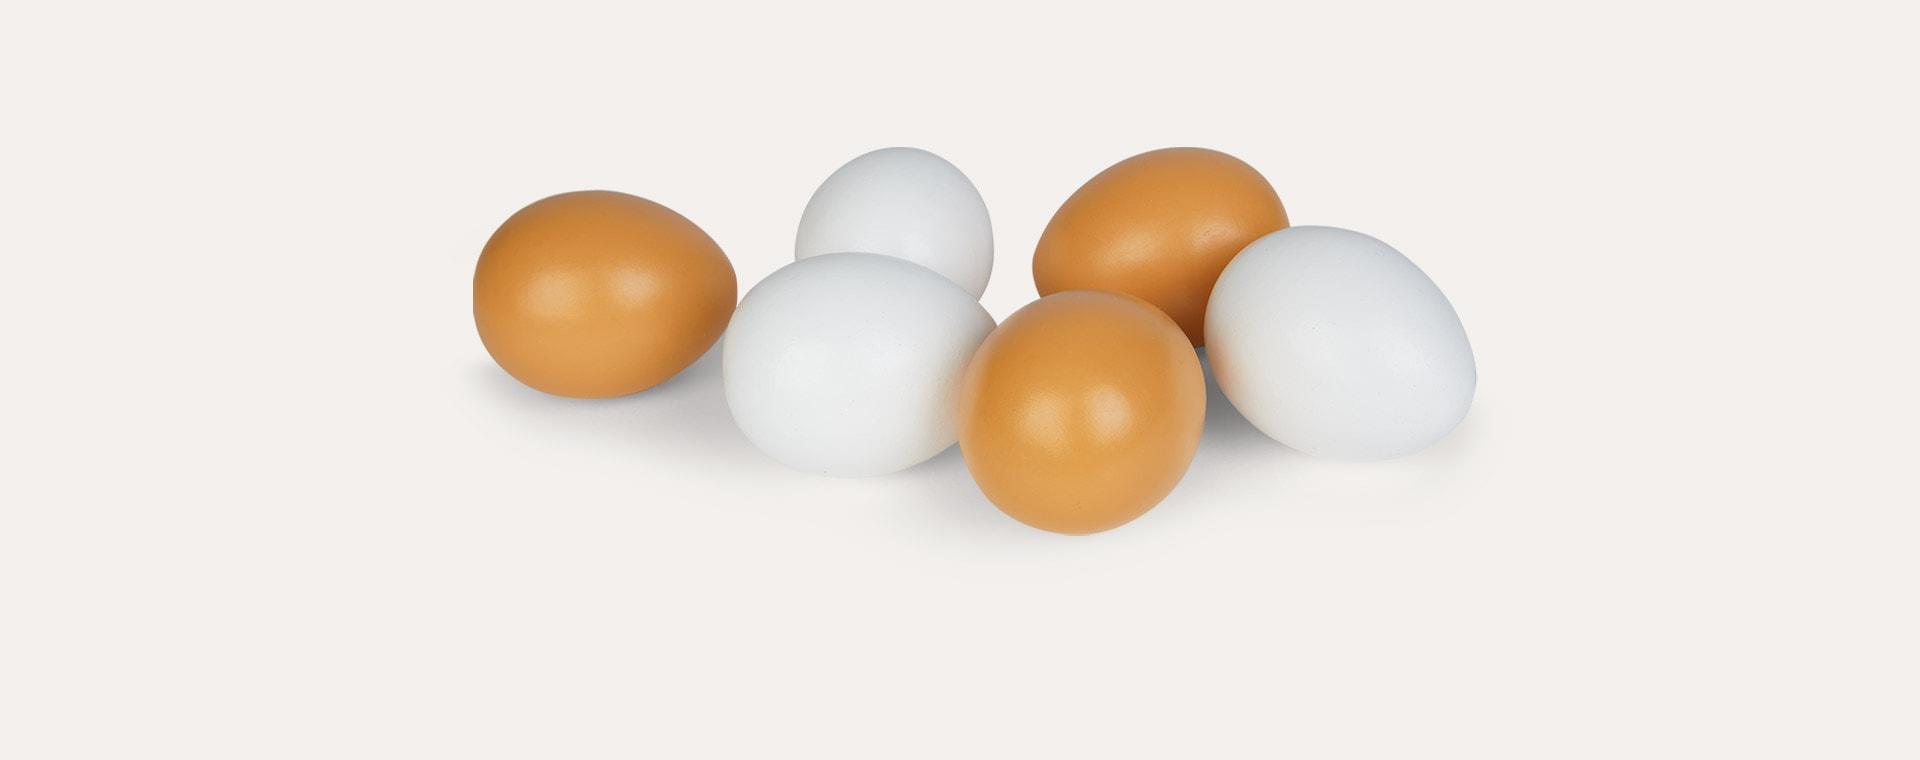 Multi Kid's Concept Eggs 6 Pack